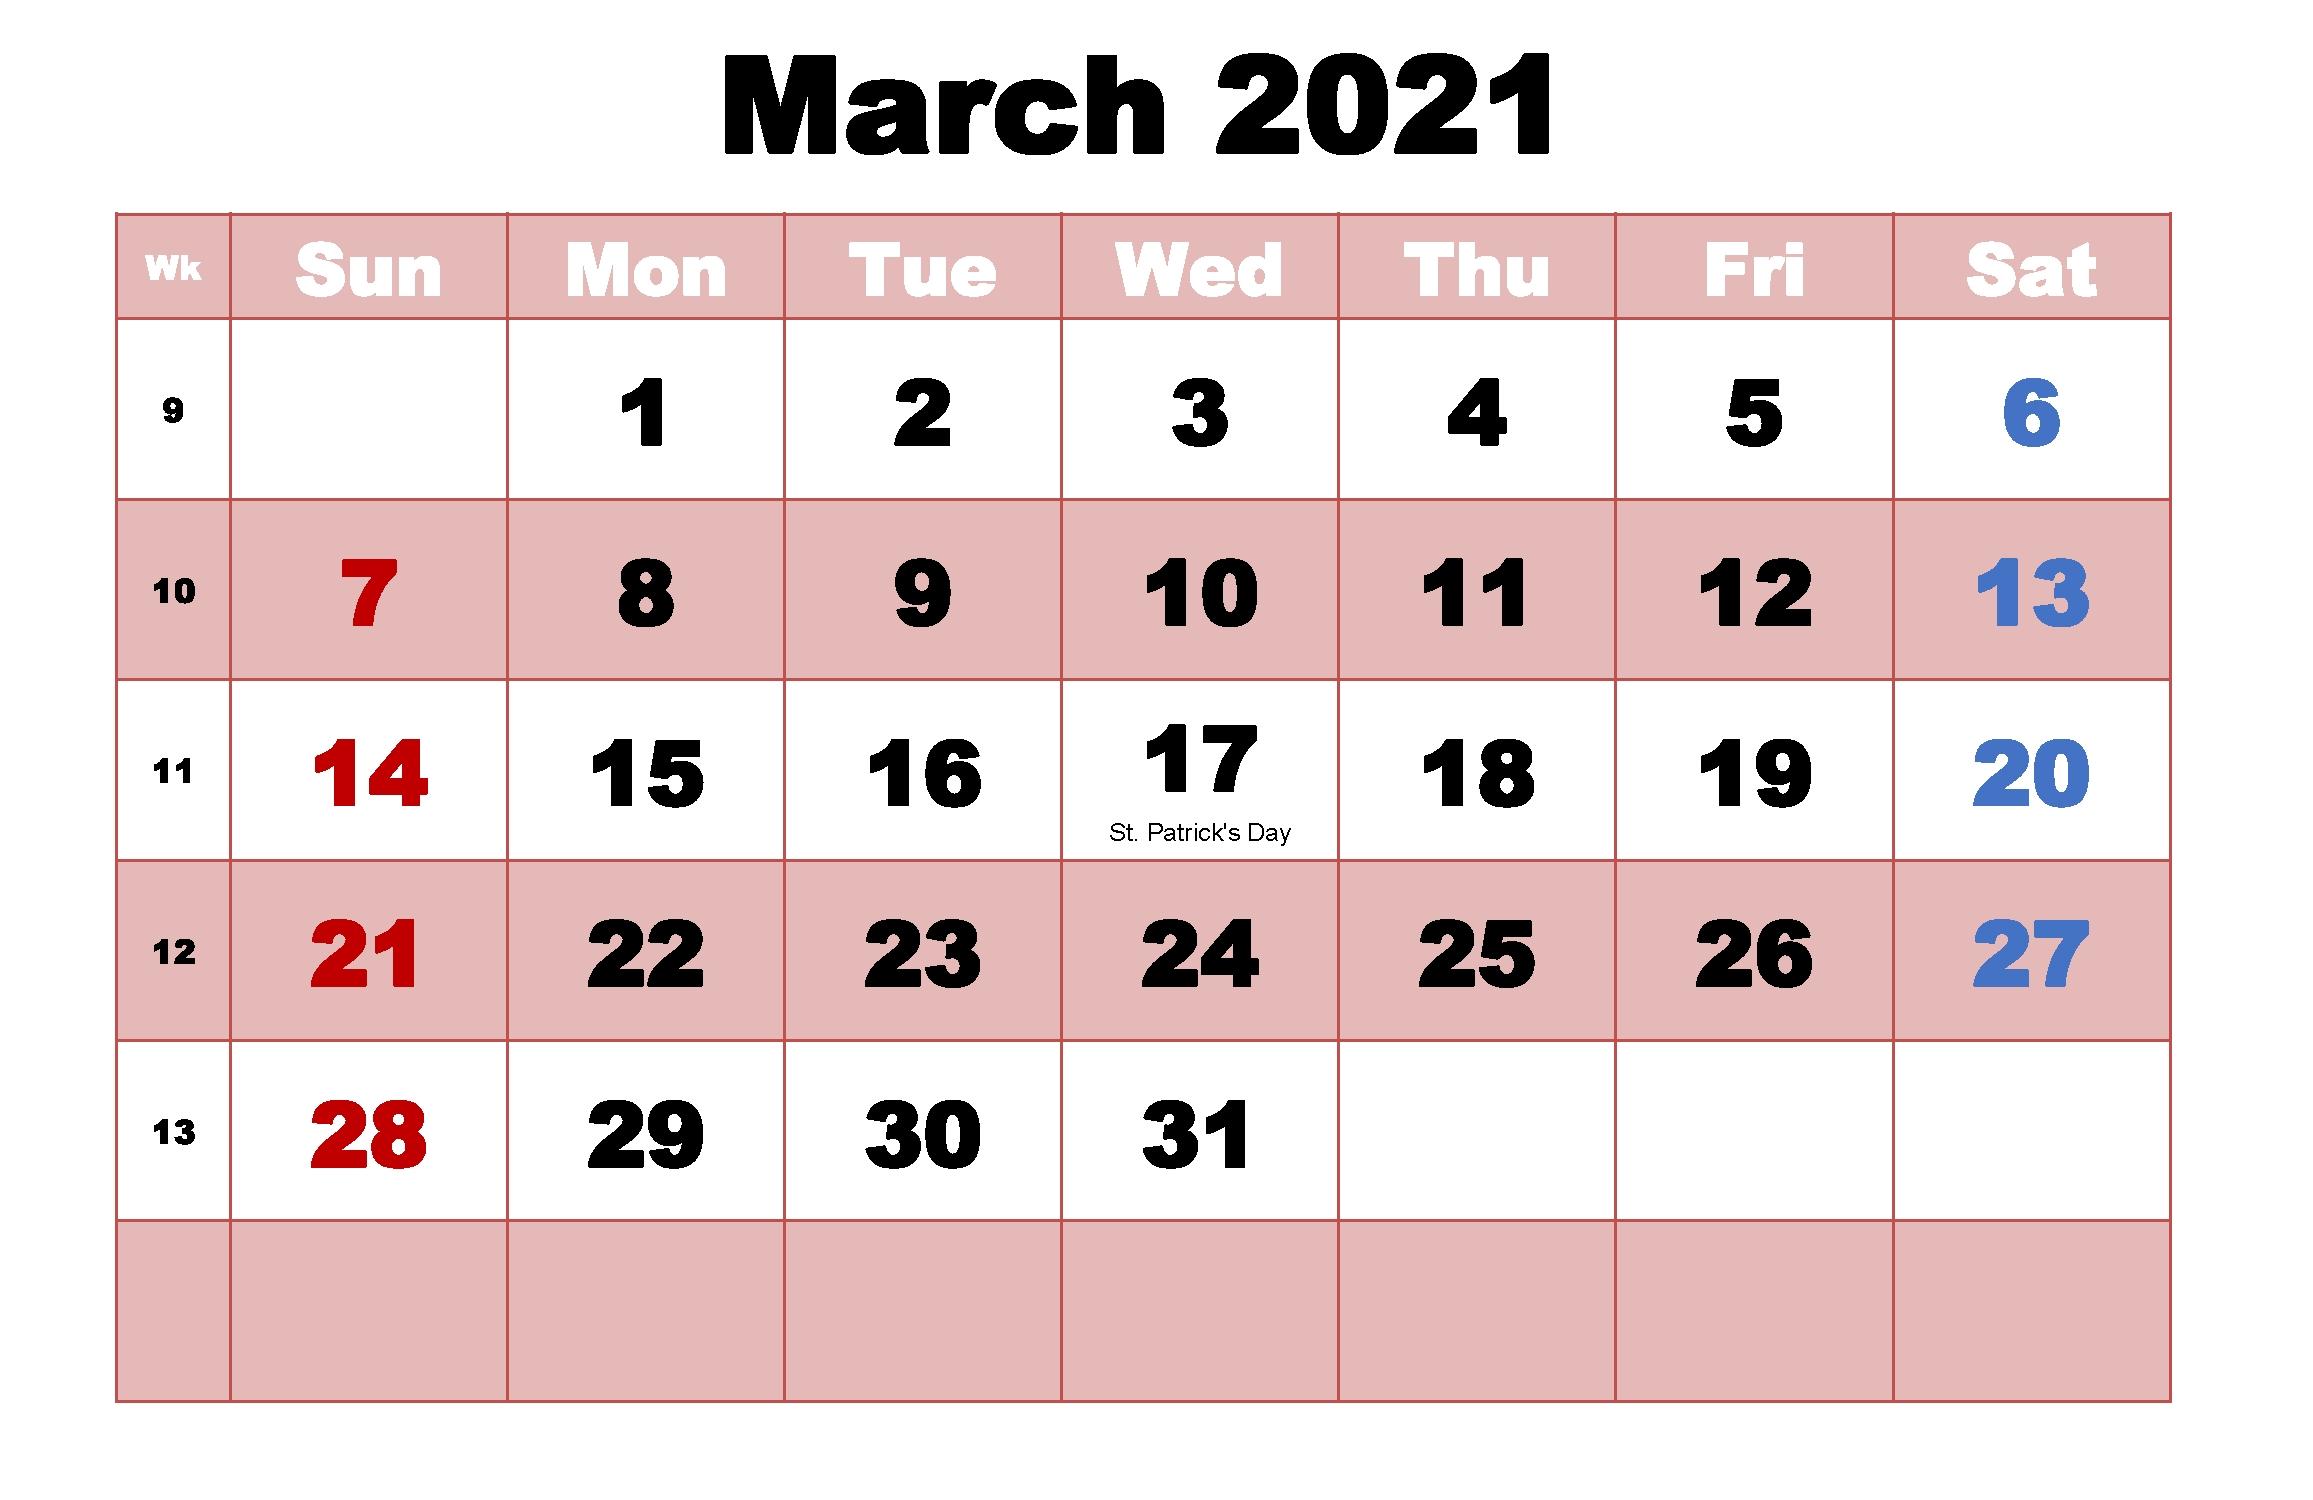 20+ Calendar 2021 March - Free Download Printable Calendar Templates ️ Show Me July 2021 Calendar